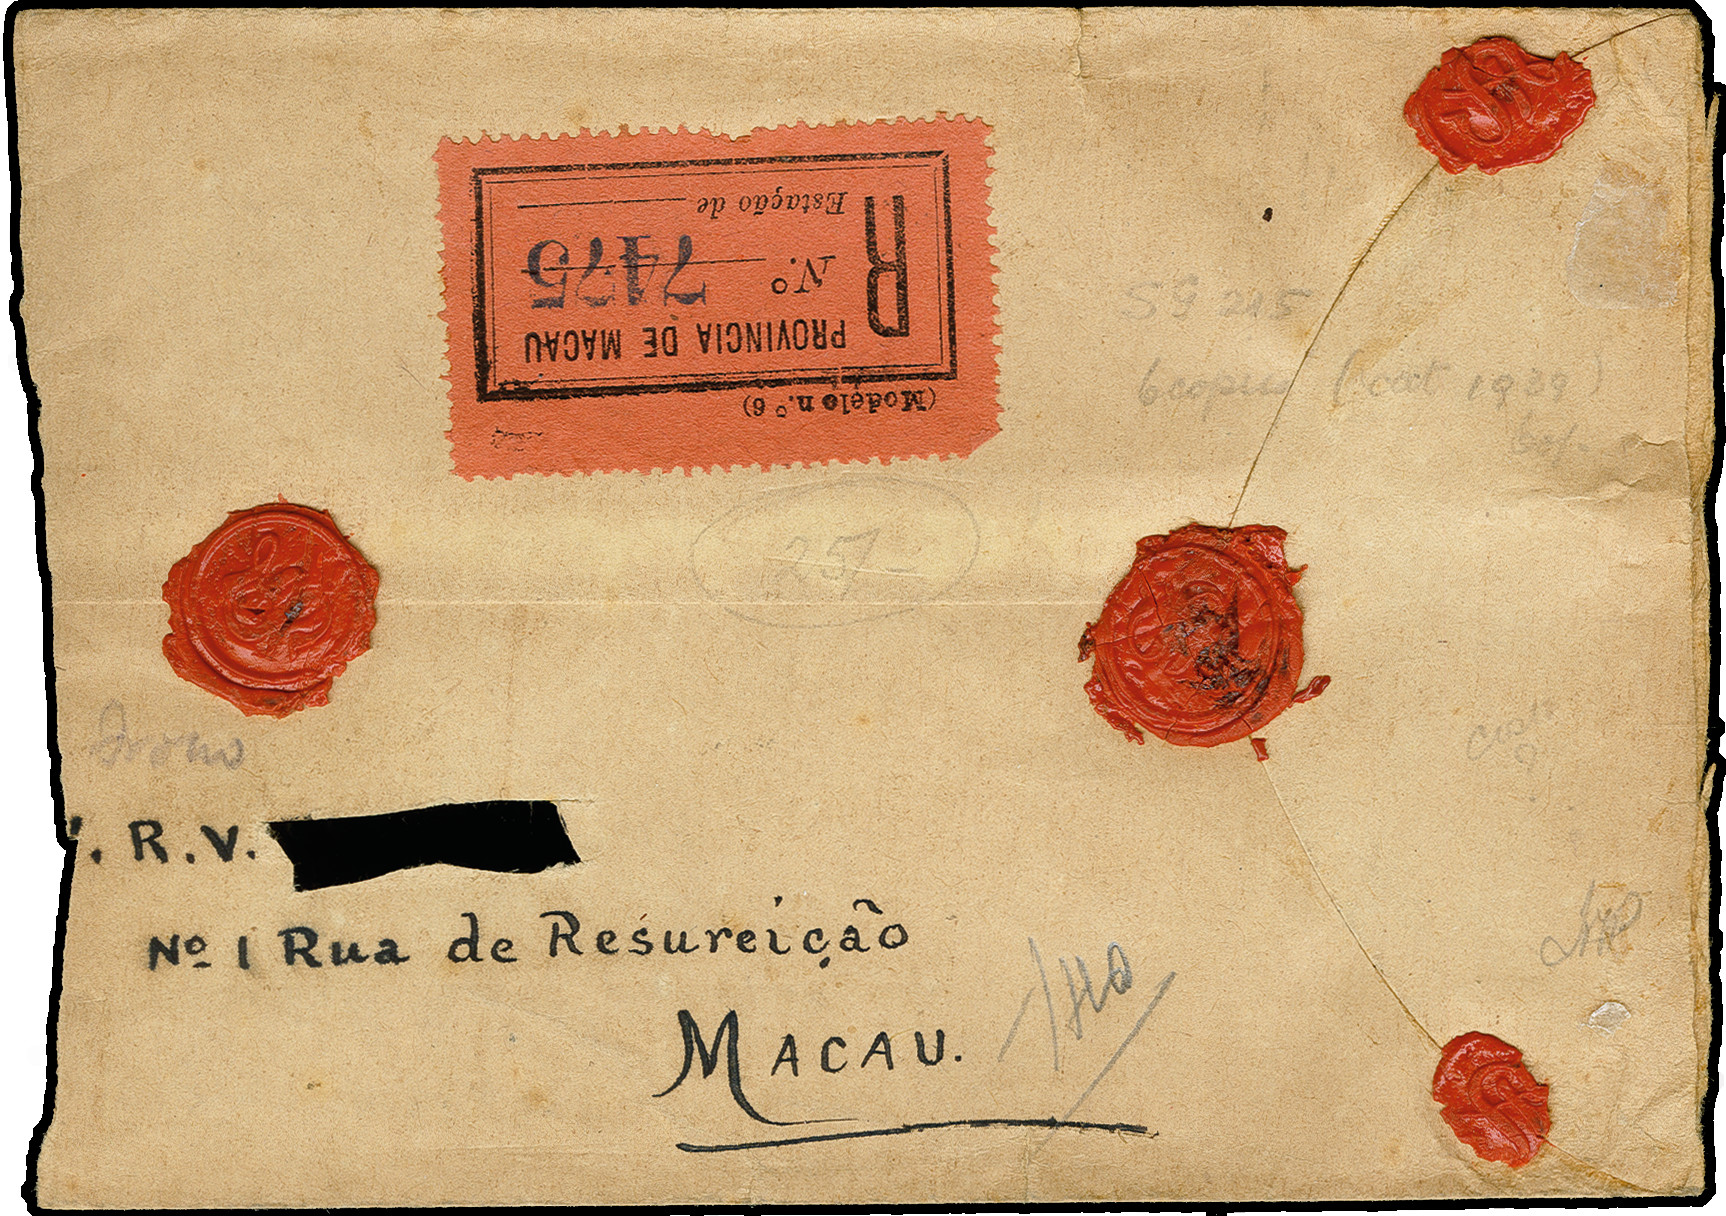 Lot 941 - portuguese colonies macao -  Heinrich Koehler Auktionen 373rd Heinrich Köhler auction - Day 1